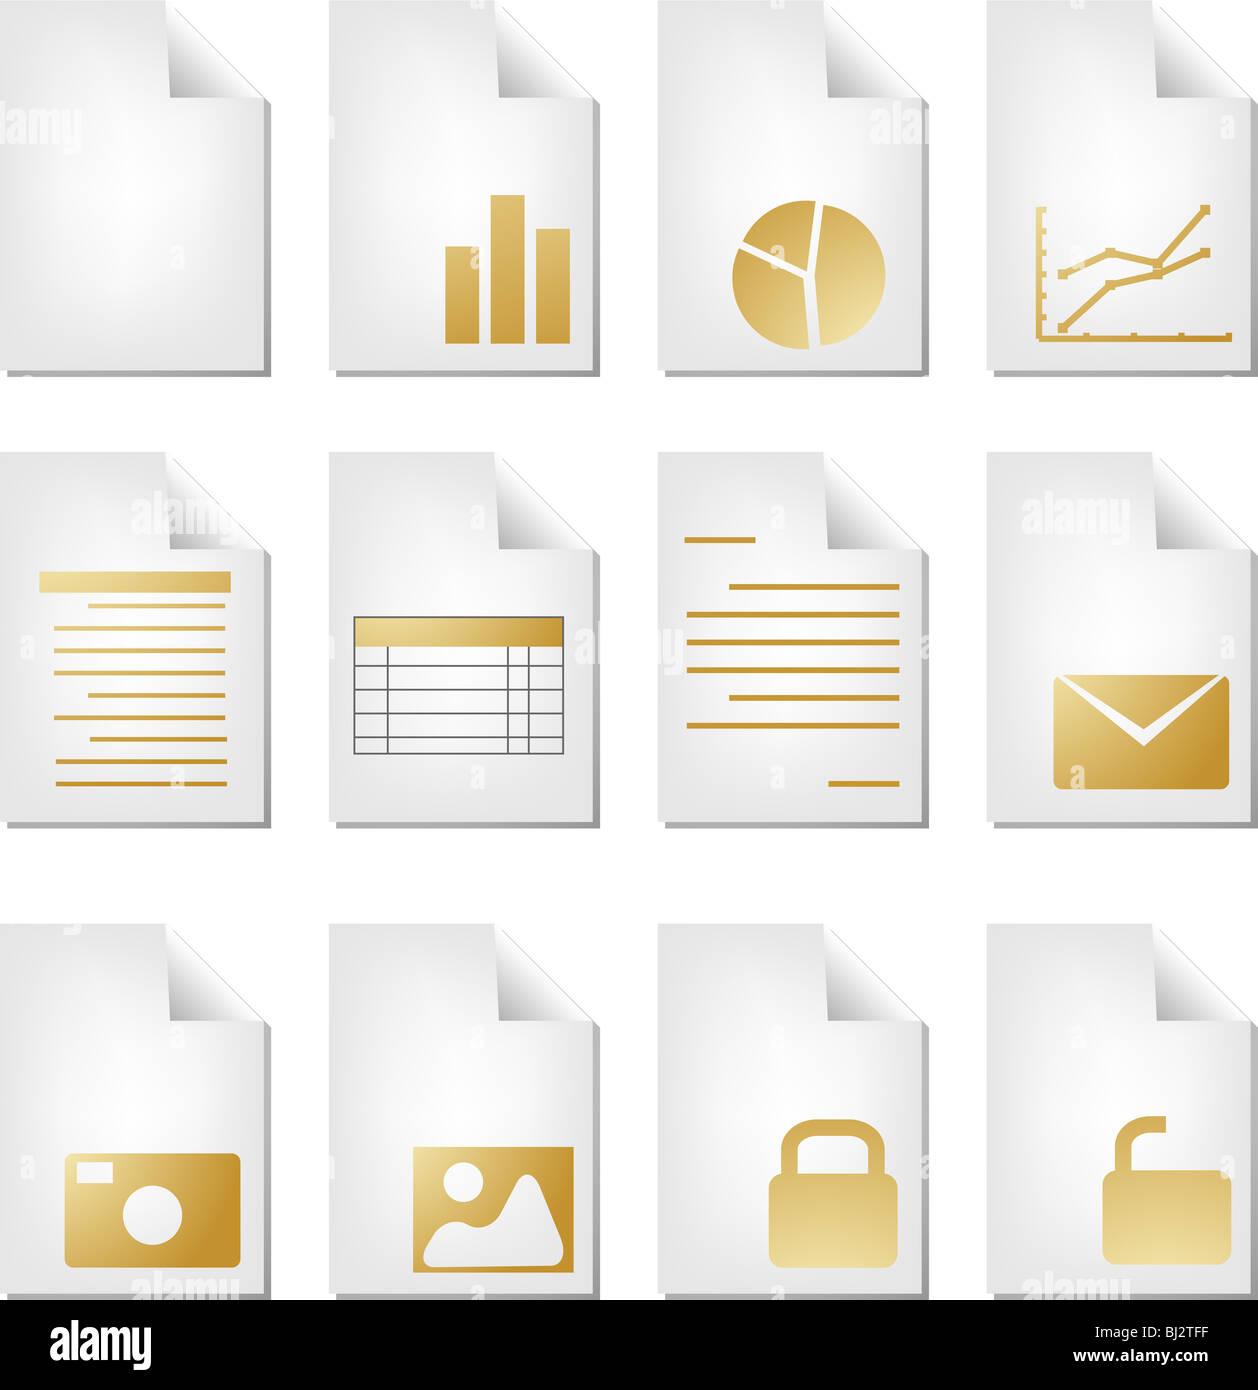 Edit Document Clip Art at Clker.com - vector clip art online, royalty free  & public domain